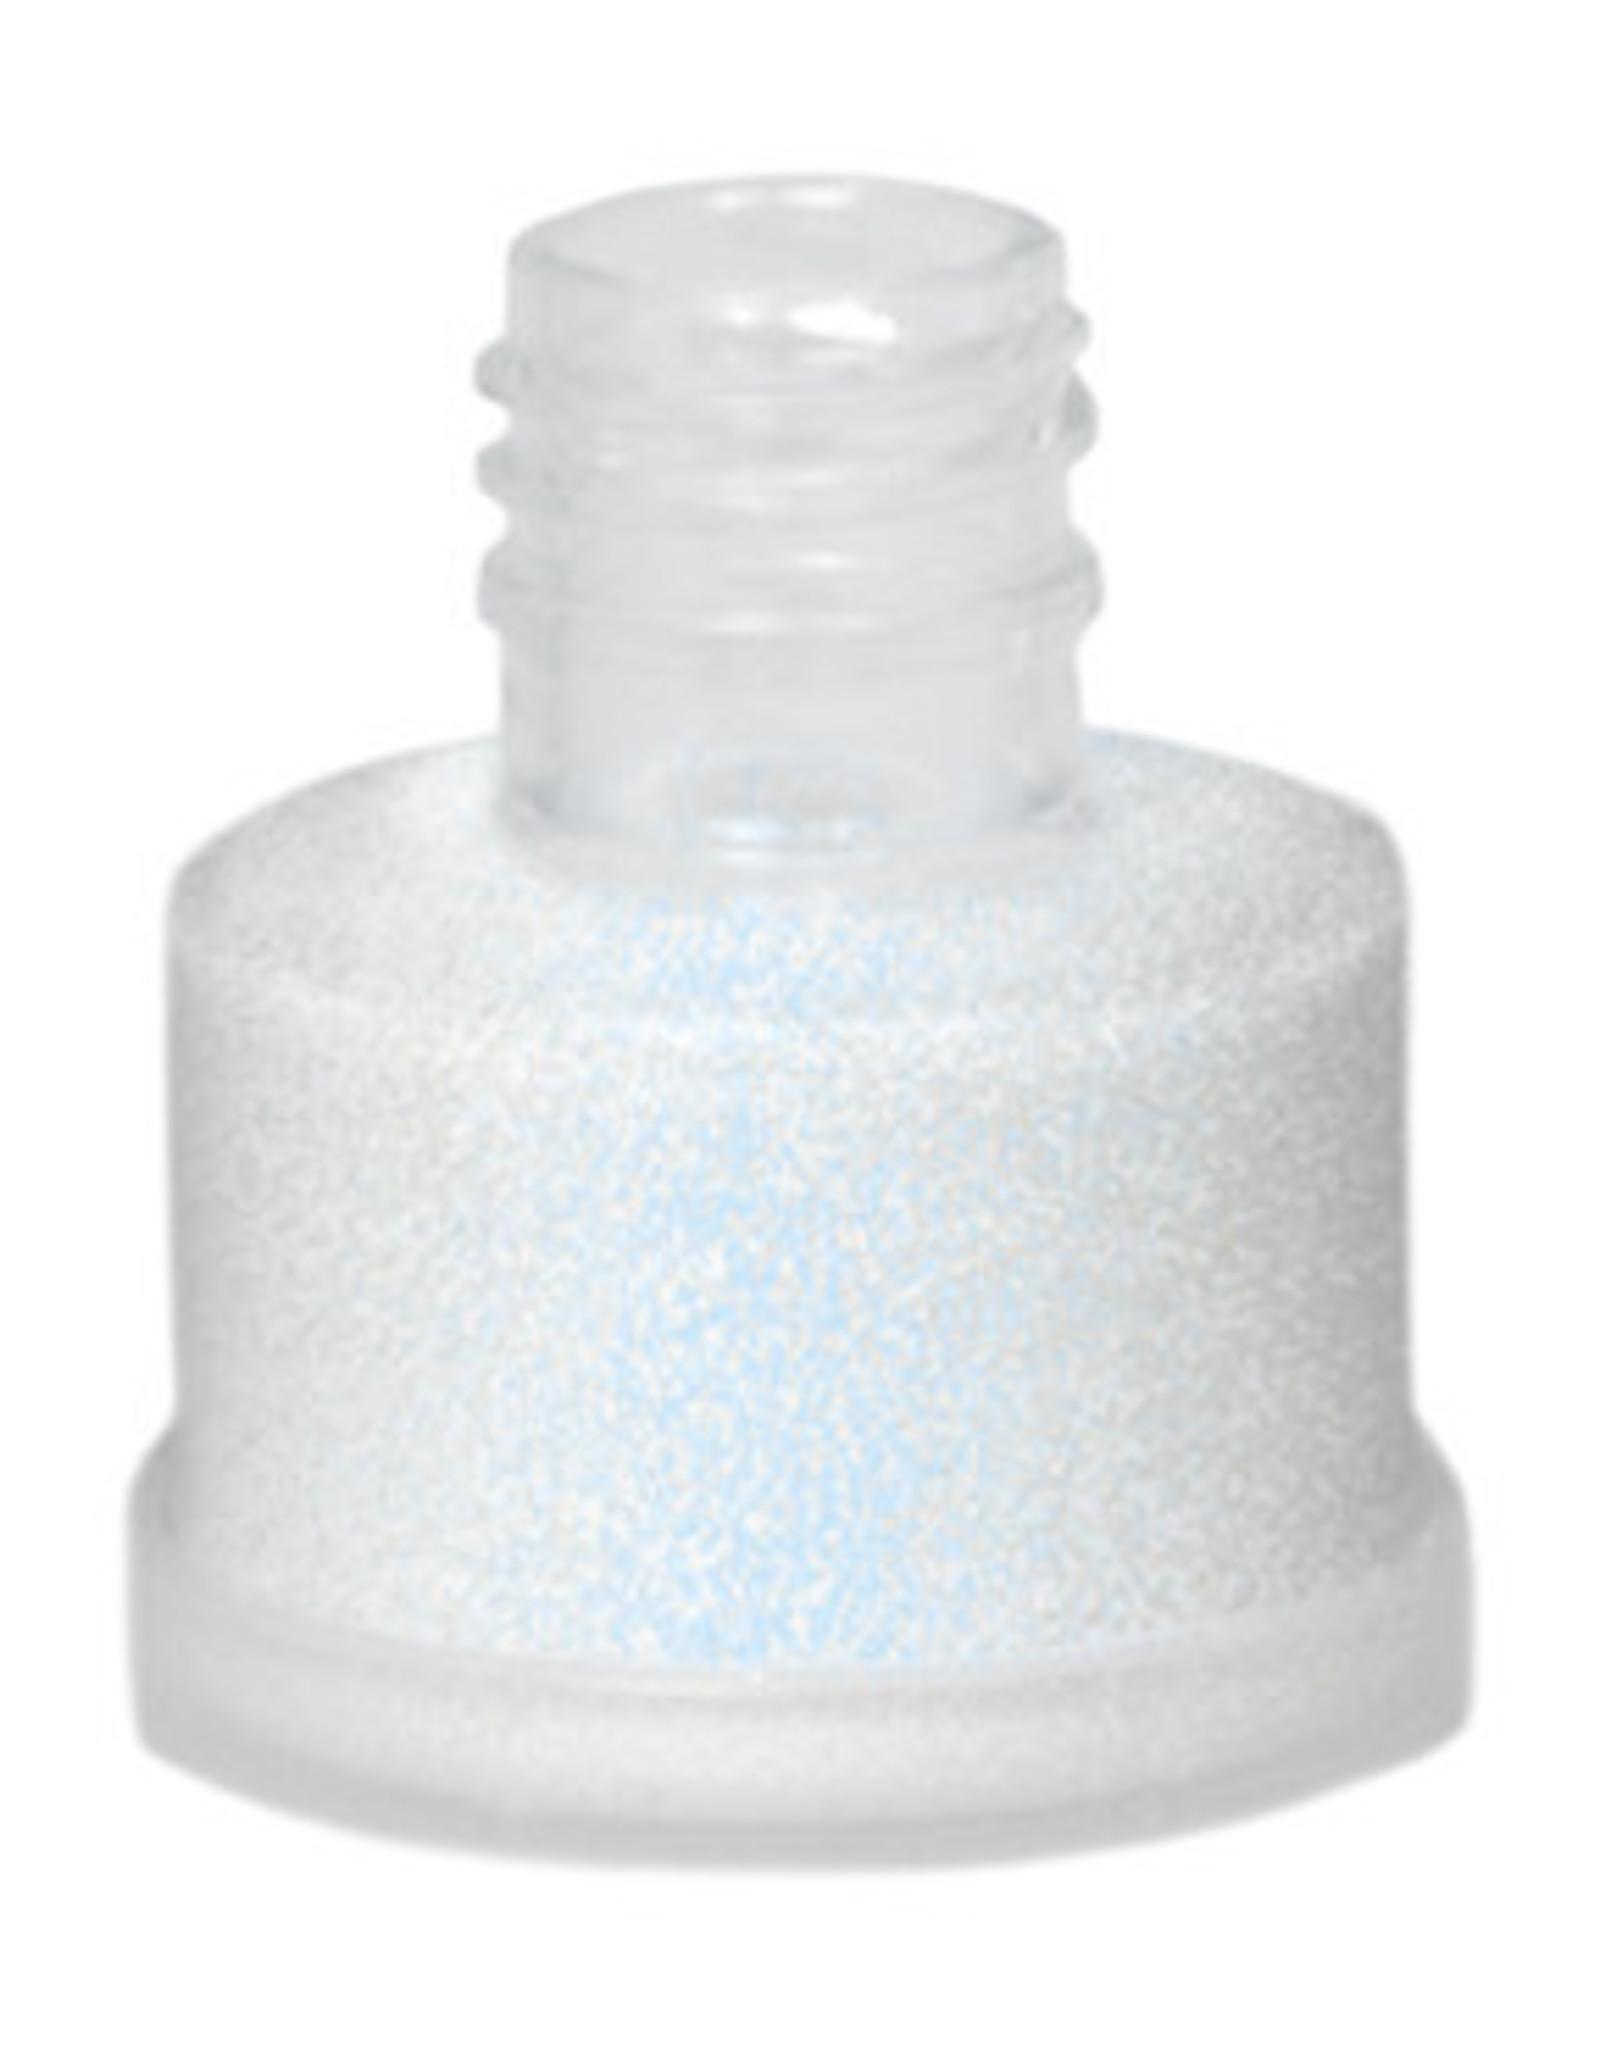 Grimas POLYGLITTER 03 Parelmoer blauw 25 ml